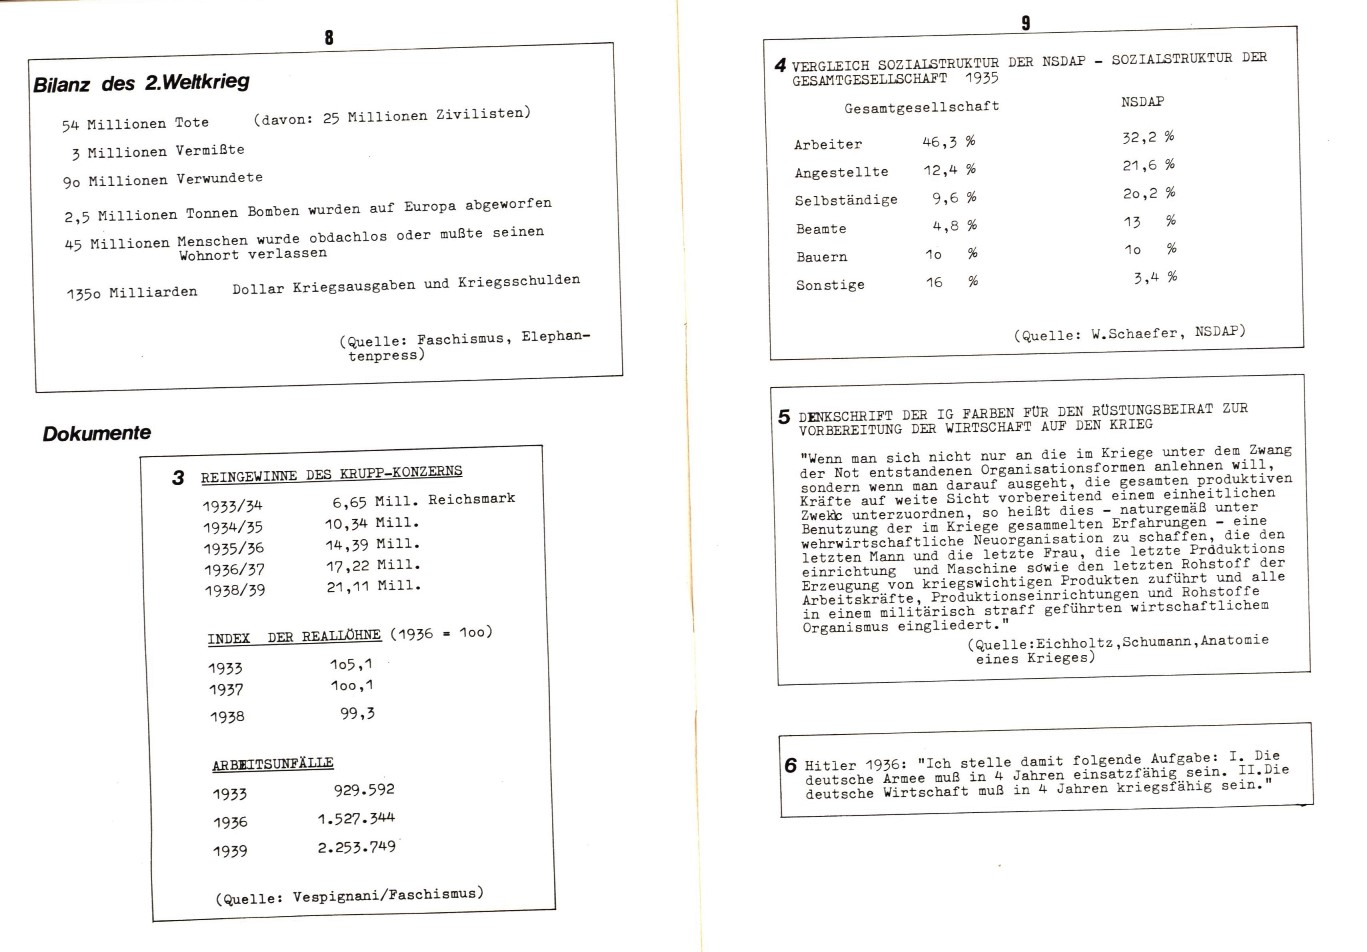 KJVD_1979_Dokumente_zum_Antikriegstag_06